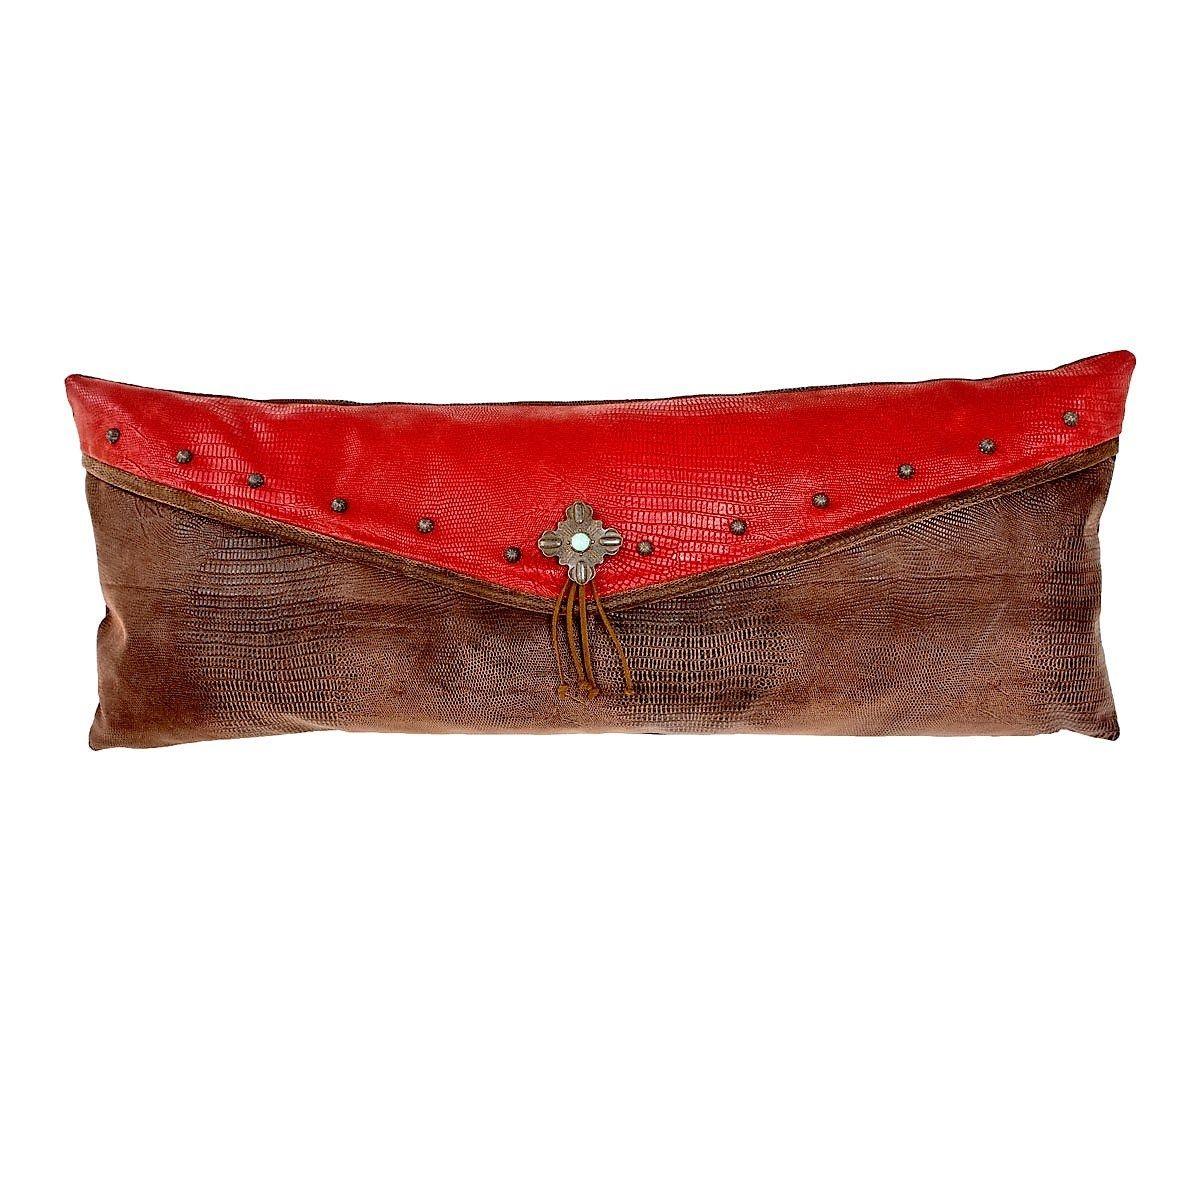 Route 20 Western Oblong Throw Pillows | Bedding | Pinterest ...